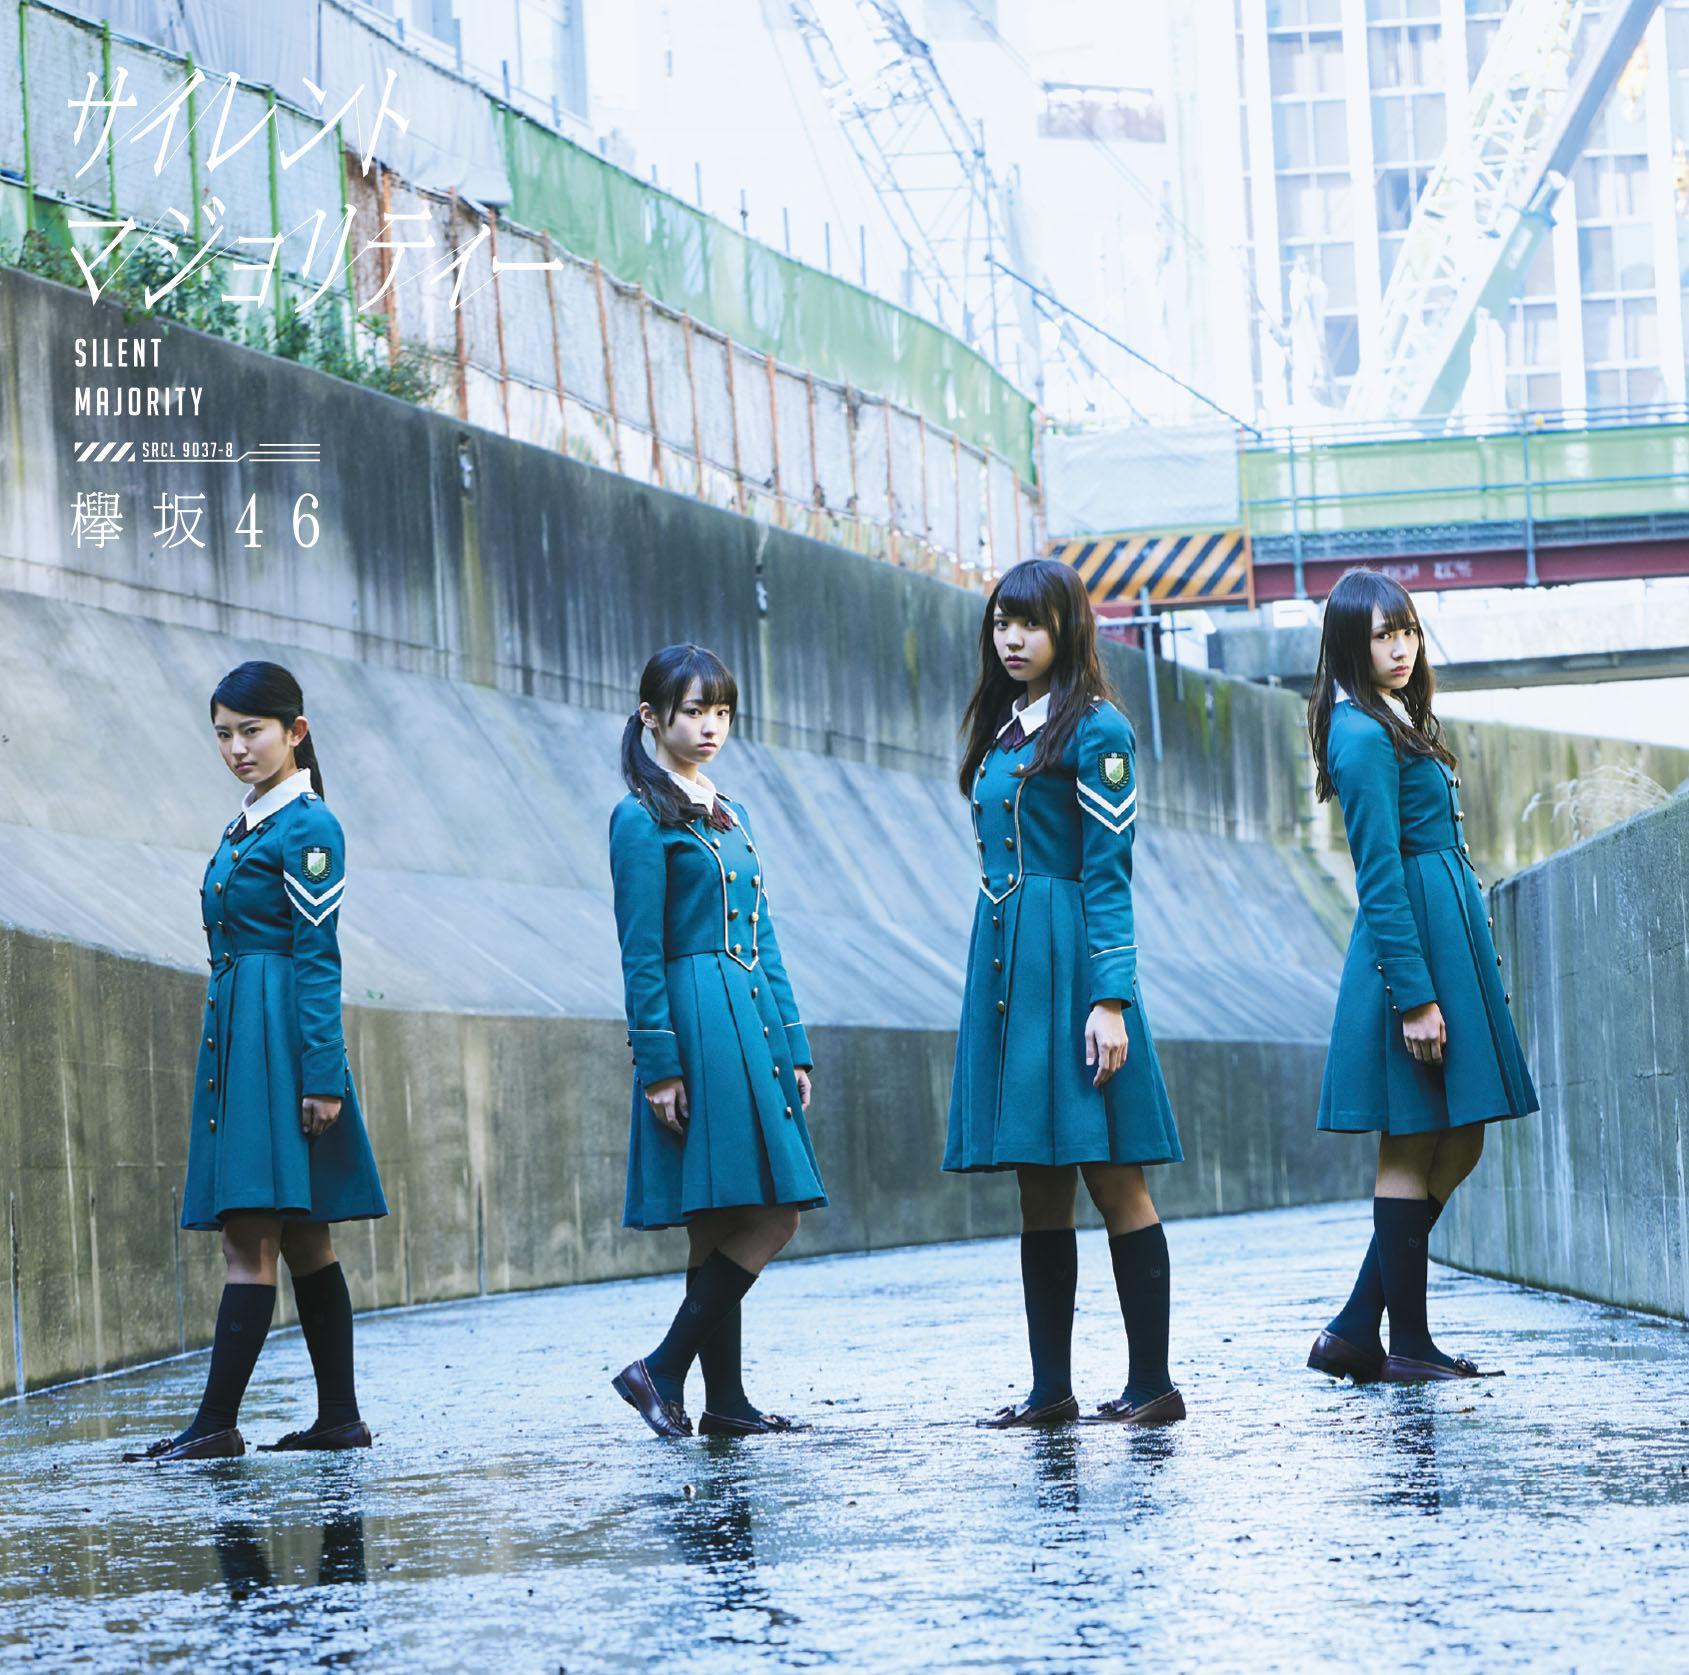 20160518.03.30 Keyakizaka46 - Silent Majority (Type A) (DVD.iso) (JPOP.ru) cover 2.jpg